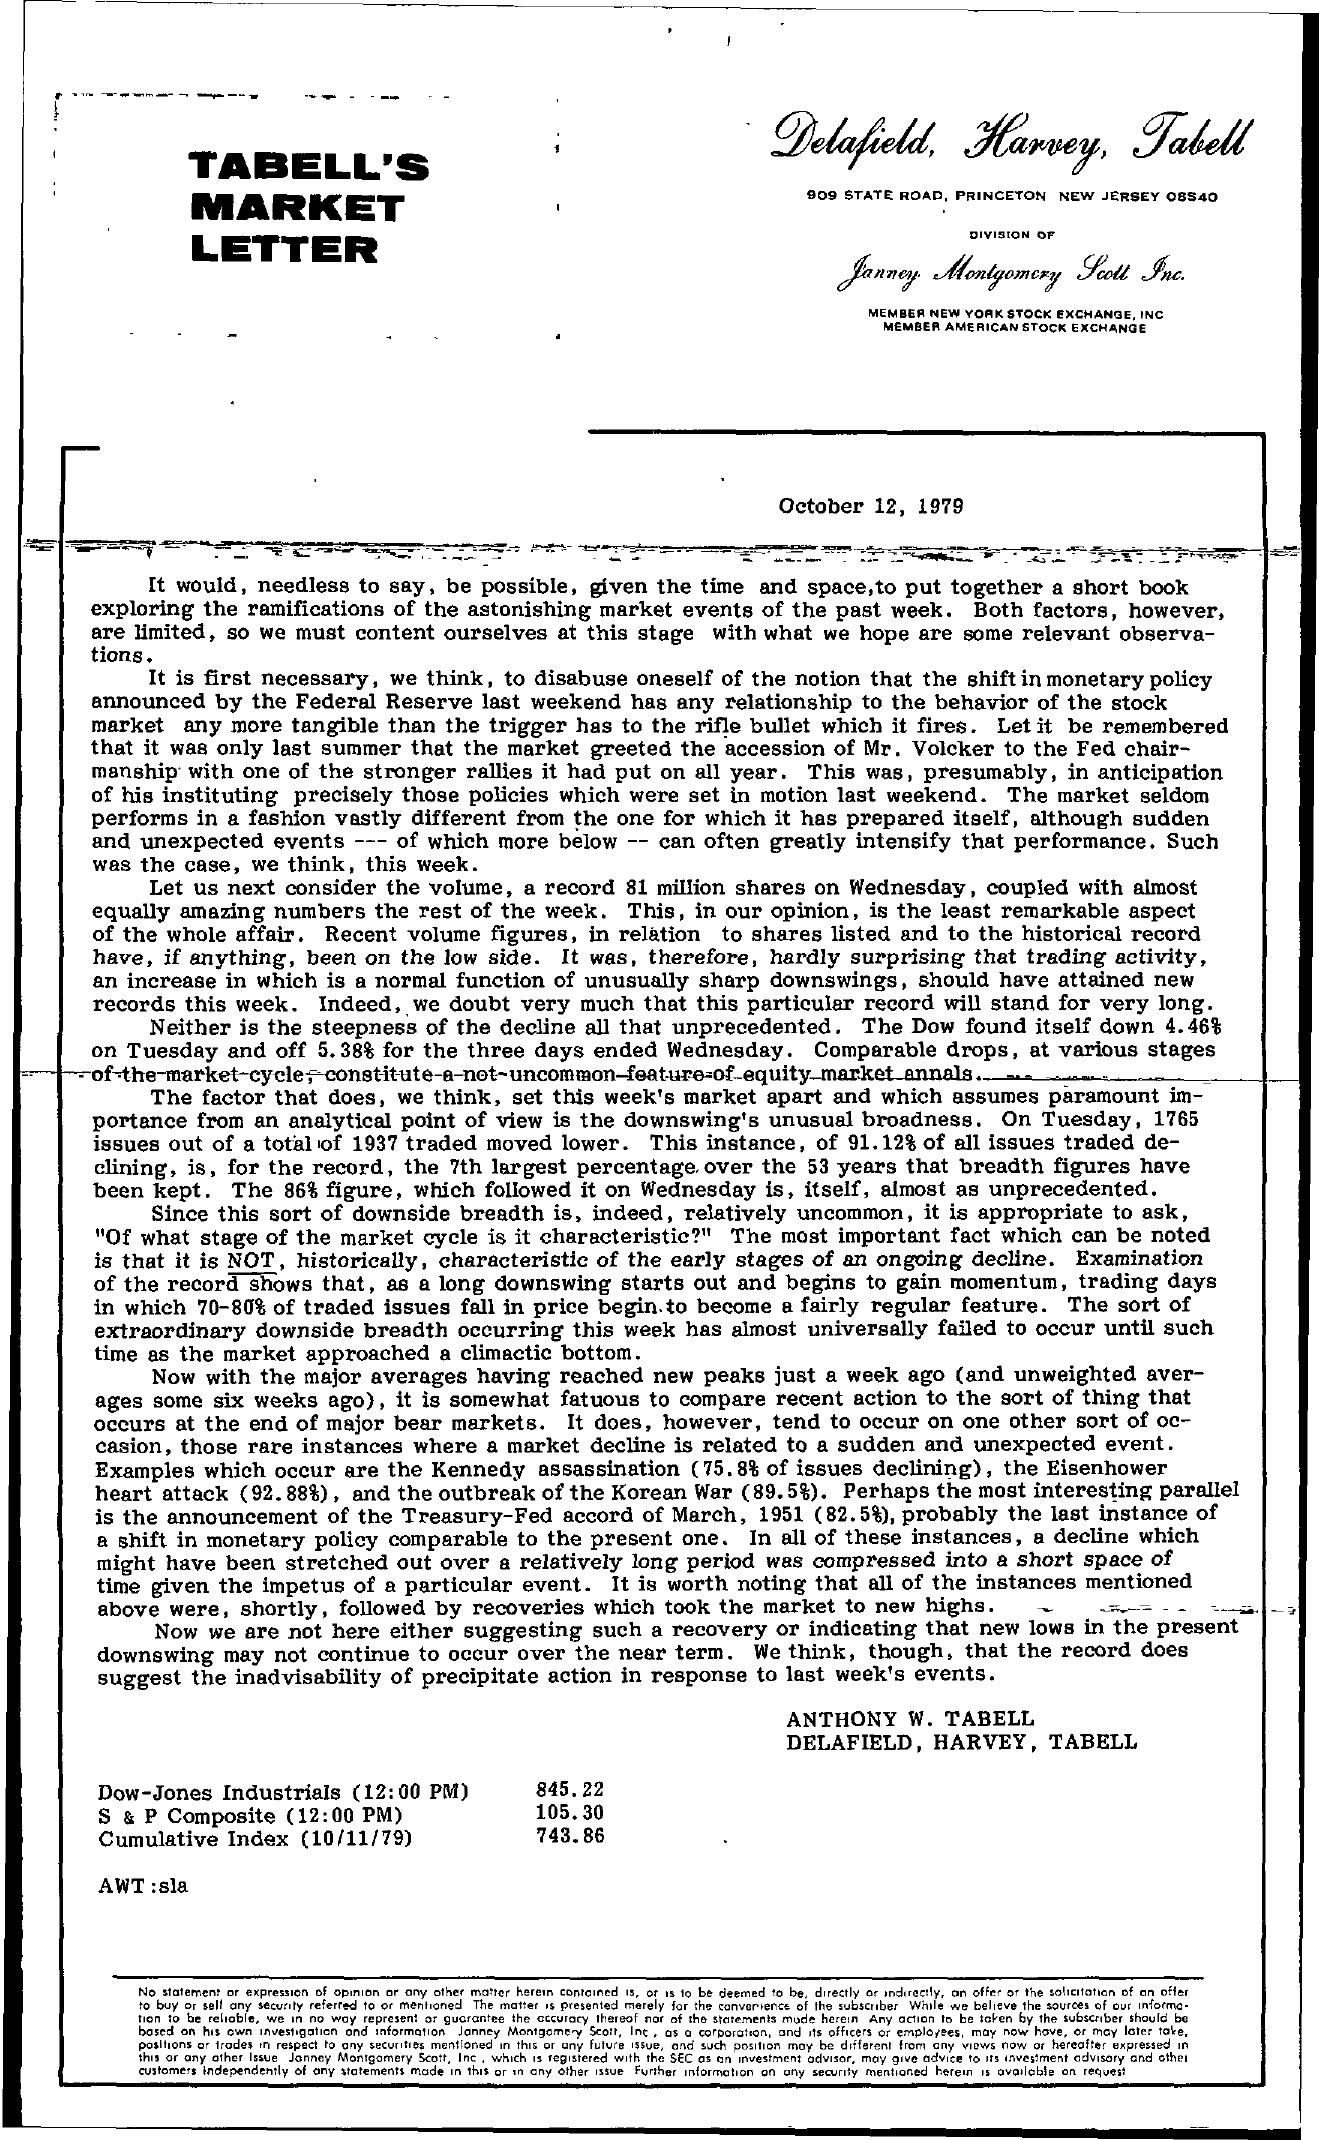 Tabell's Market Letter - October 12, 1979